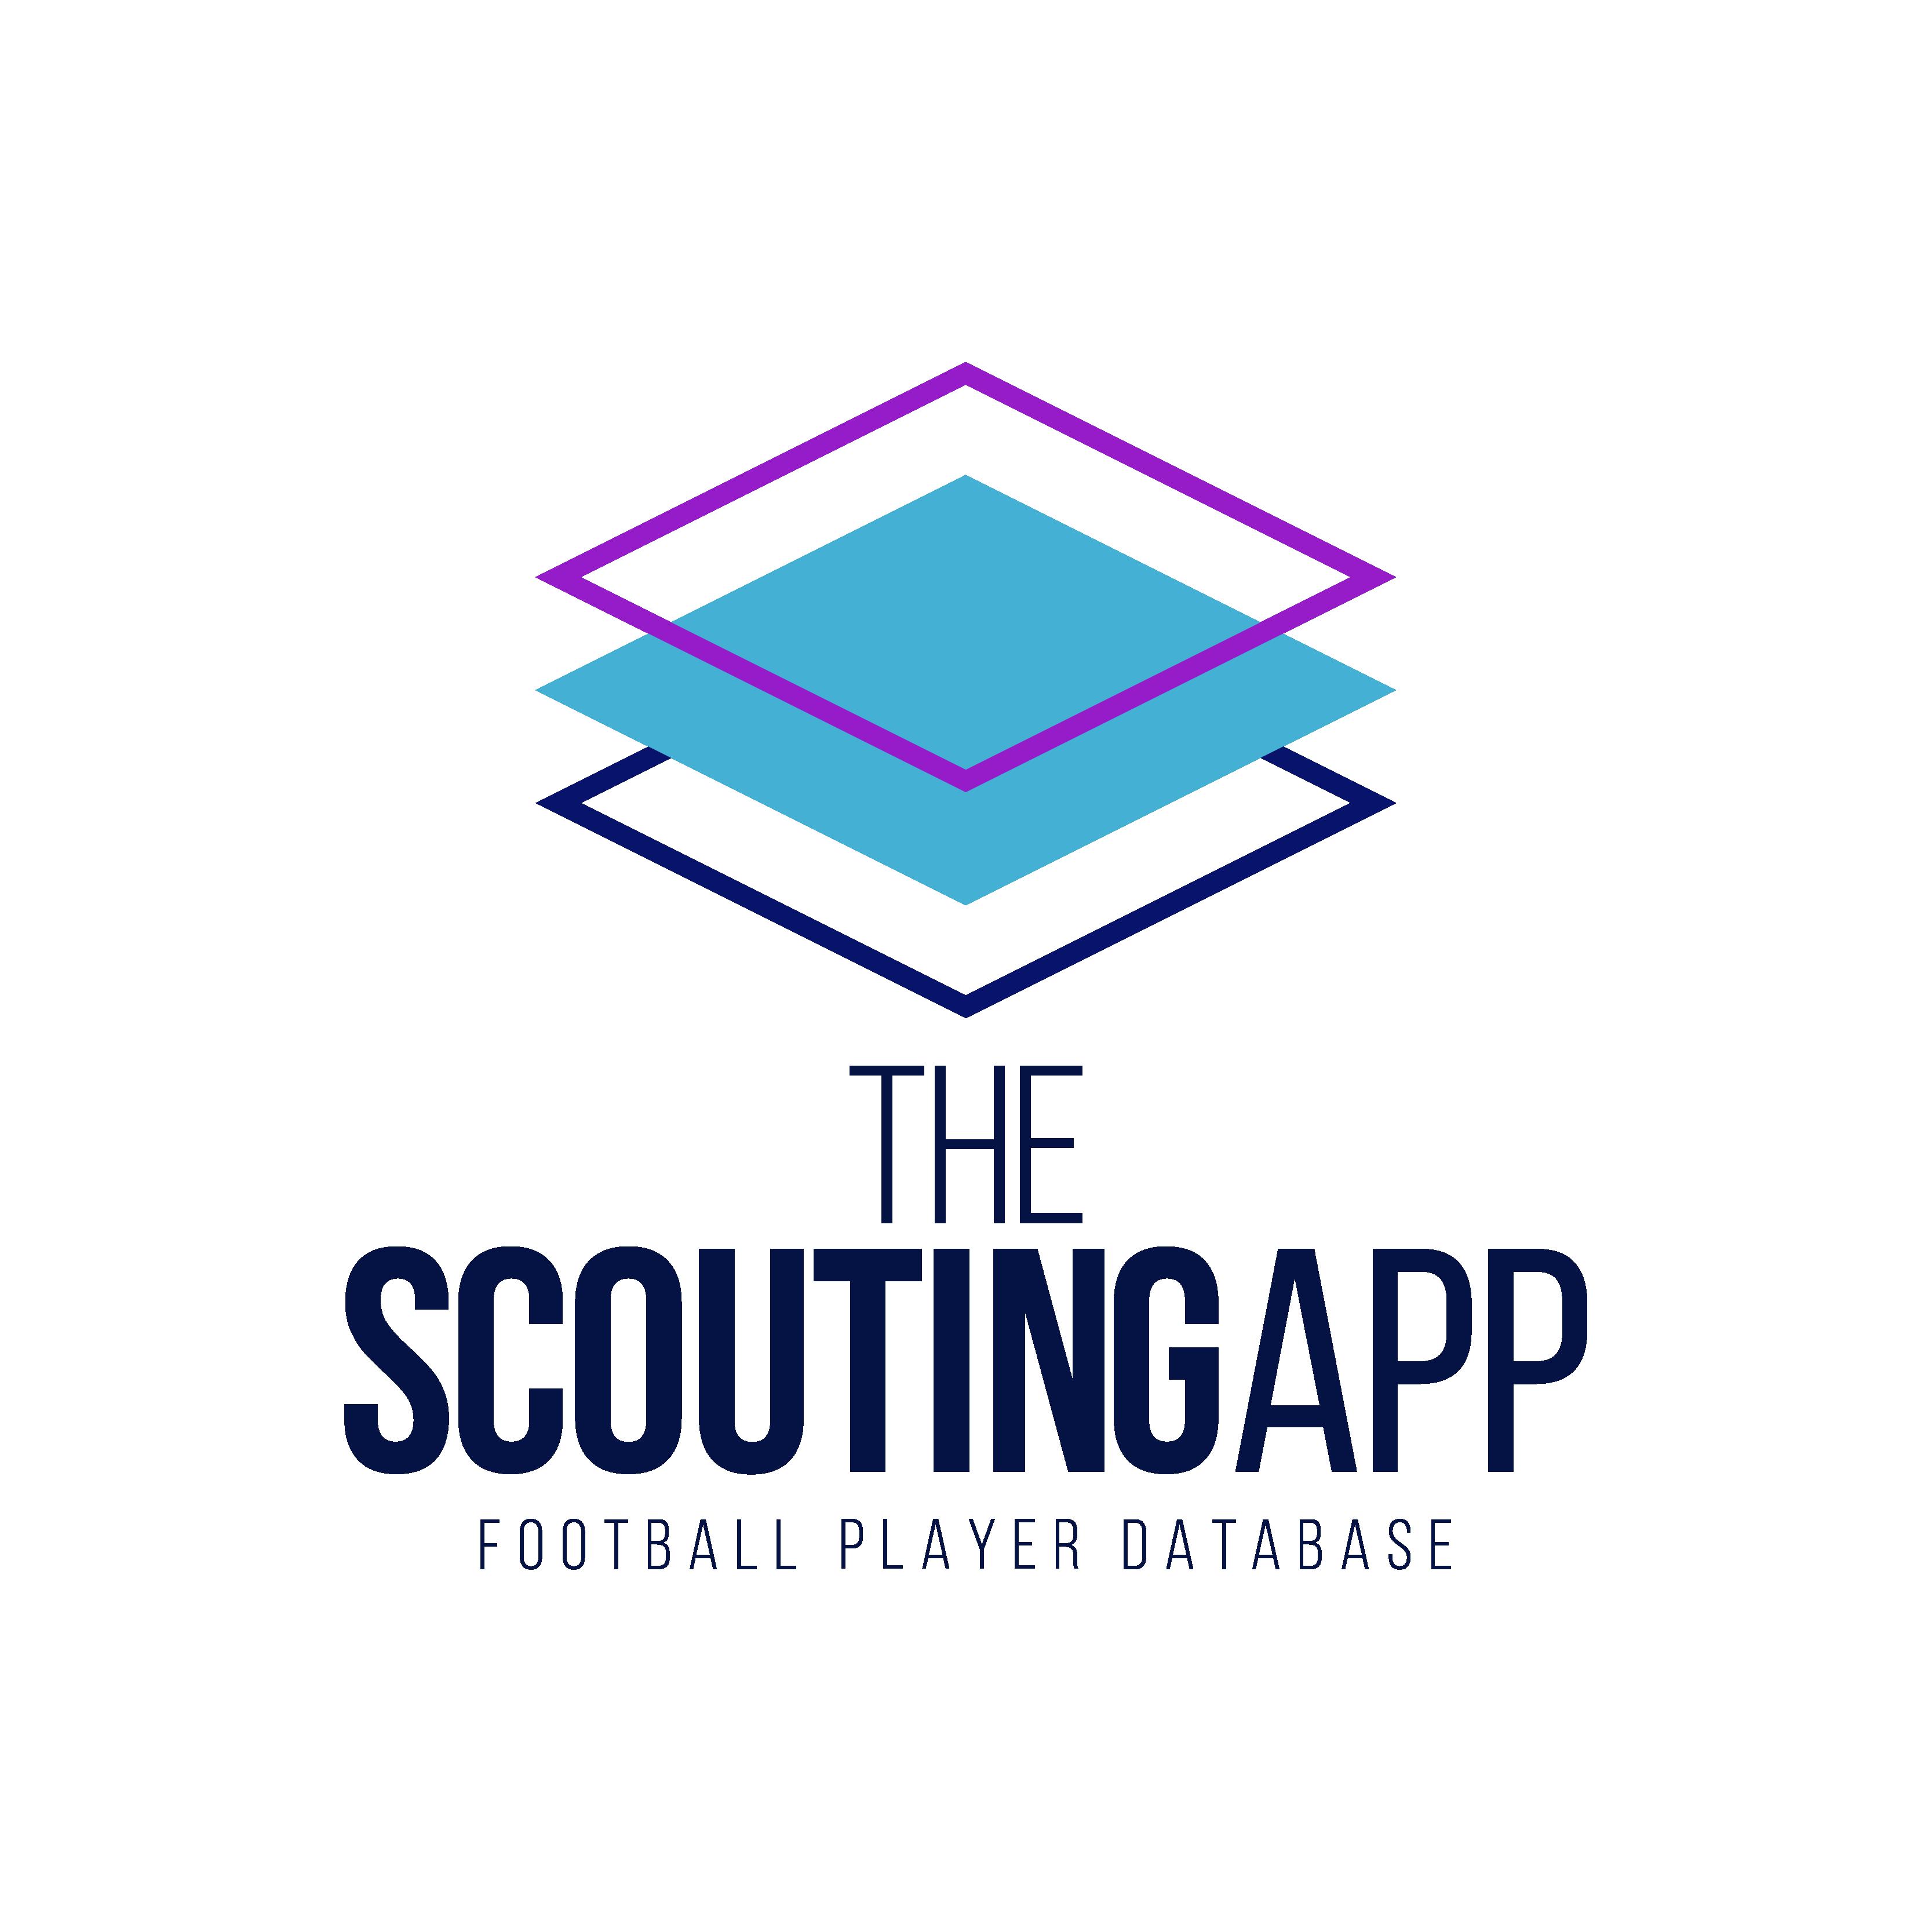 Scouting app